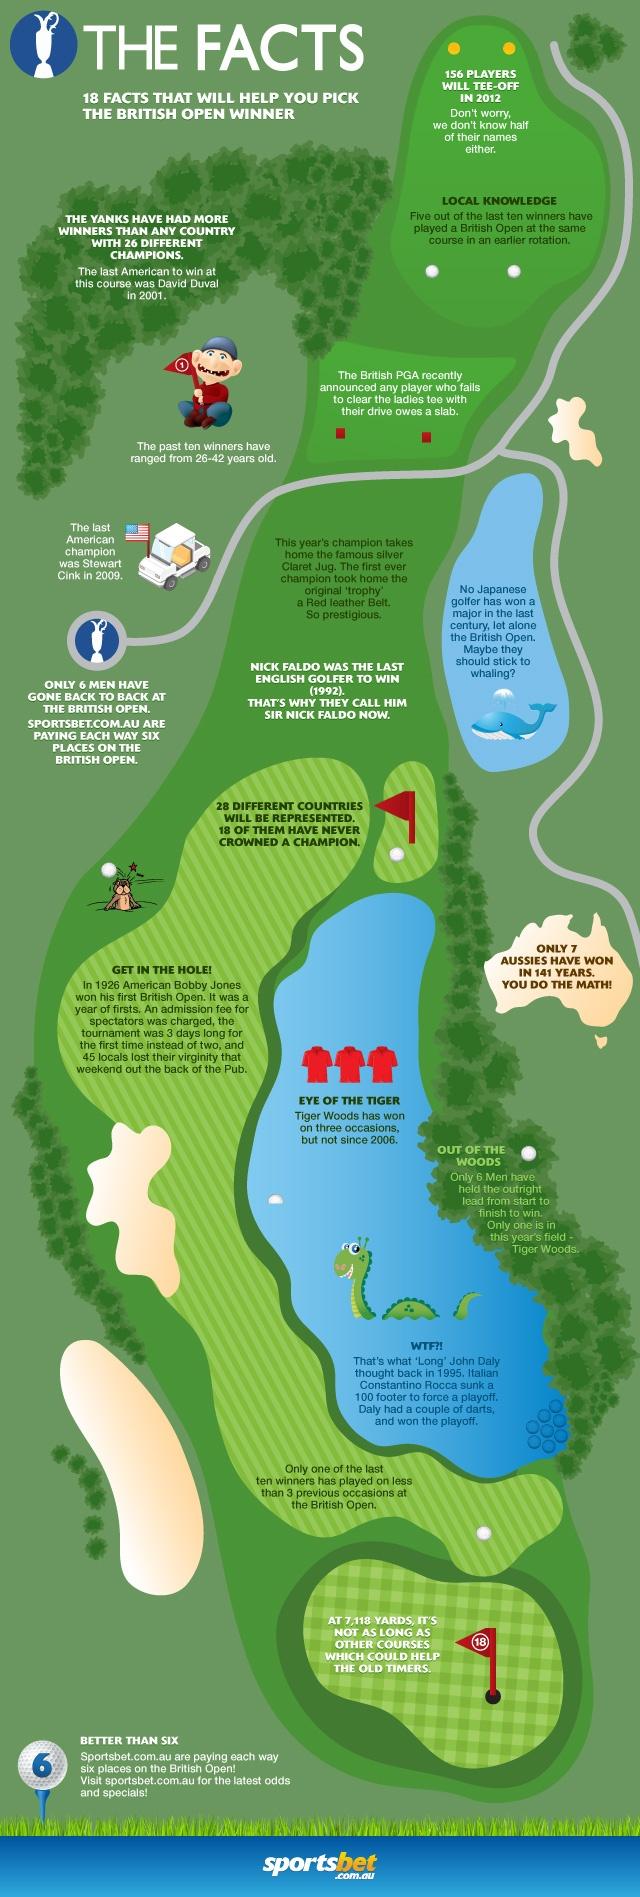 British Open - Infographic - Sportsbet.com.au